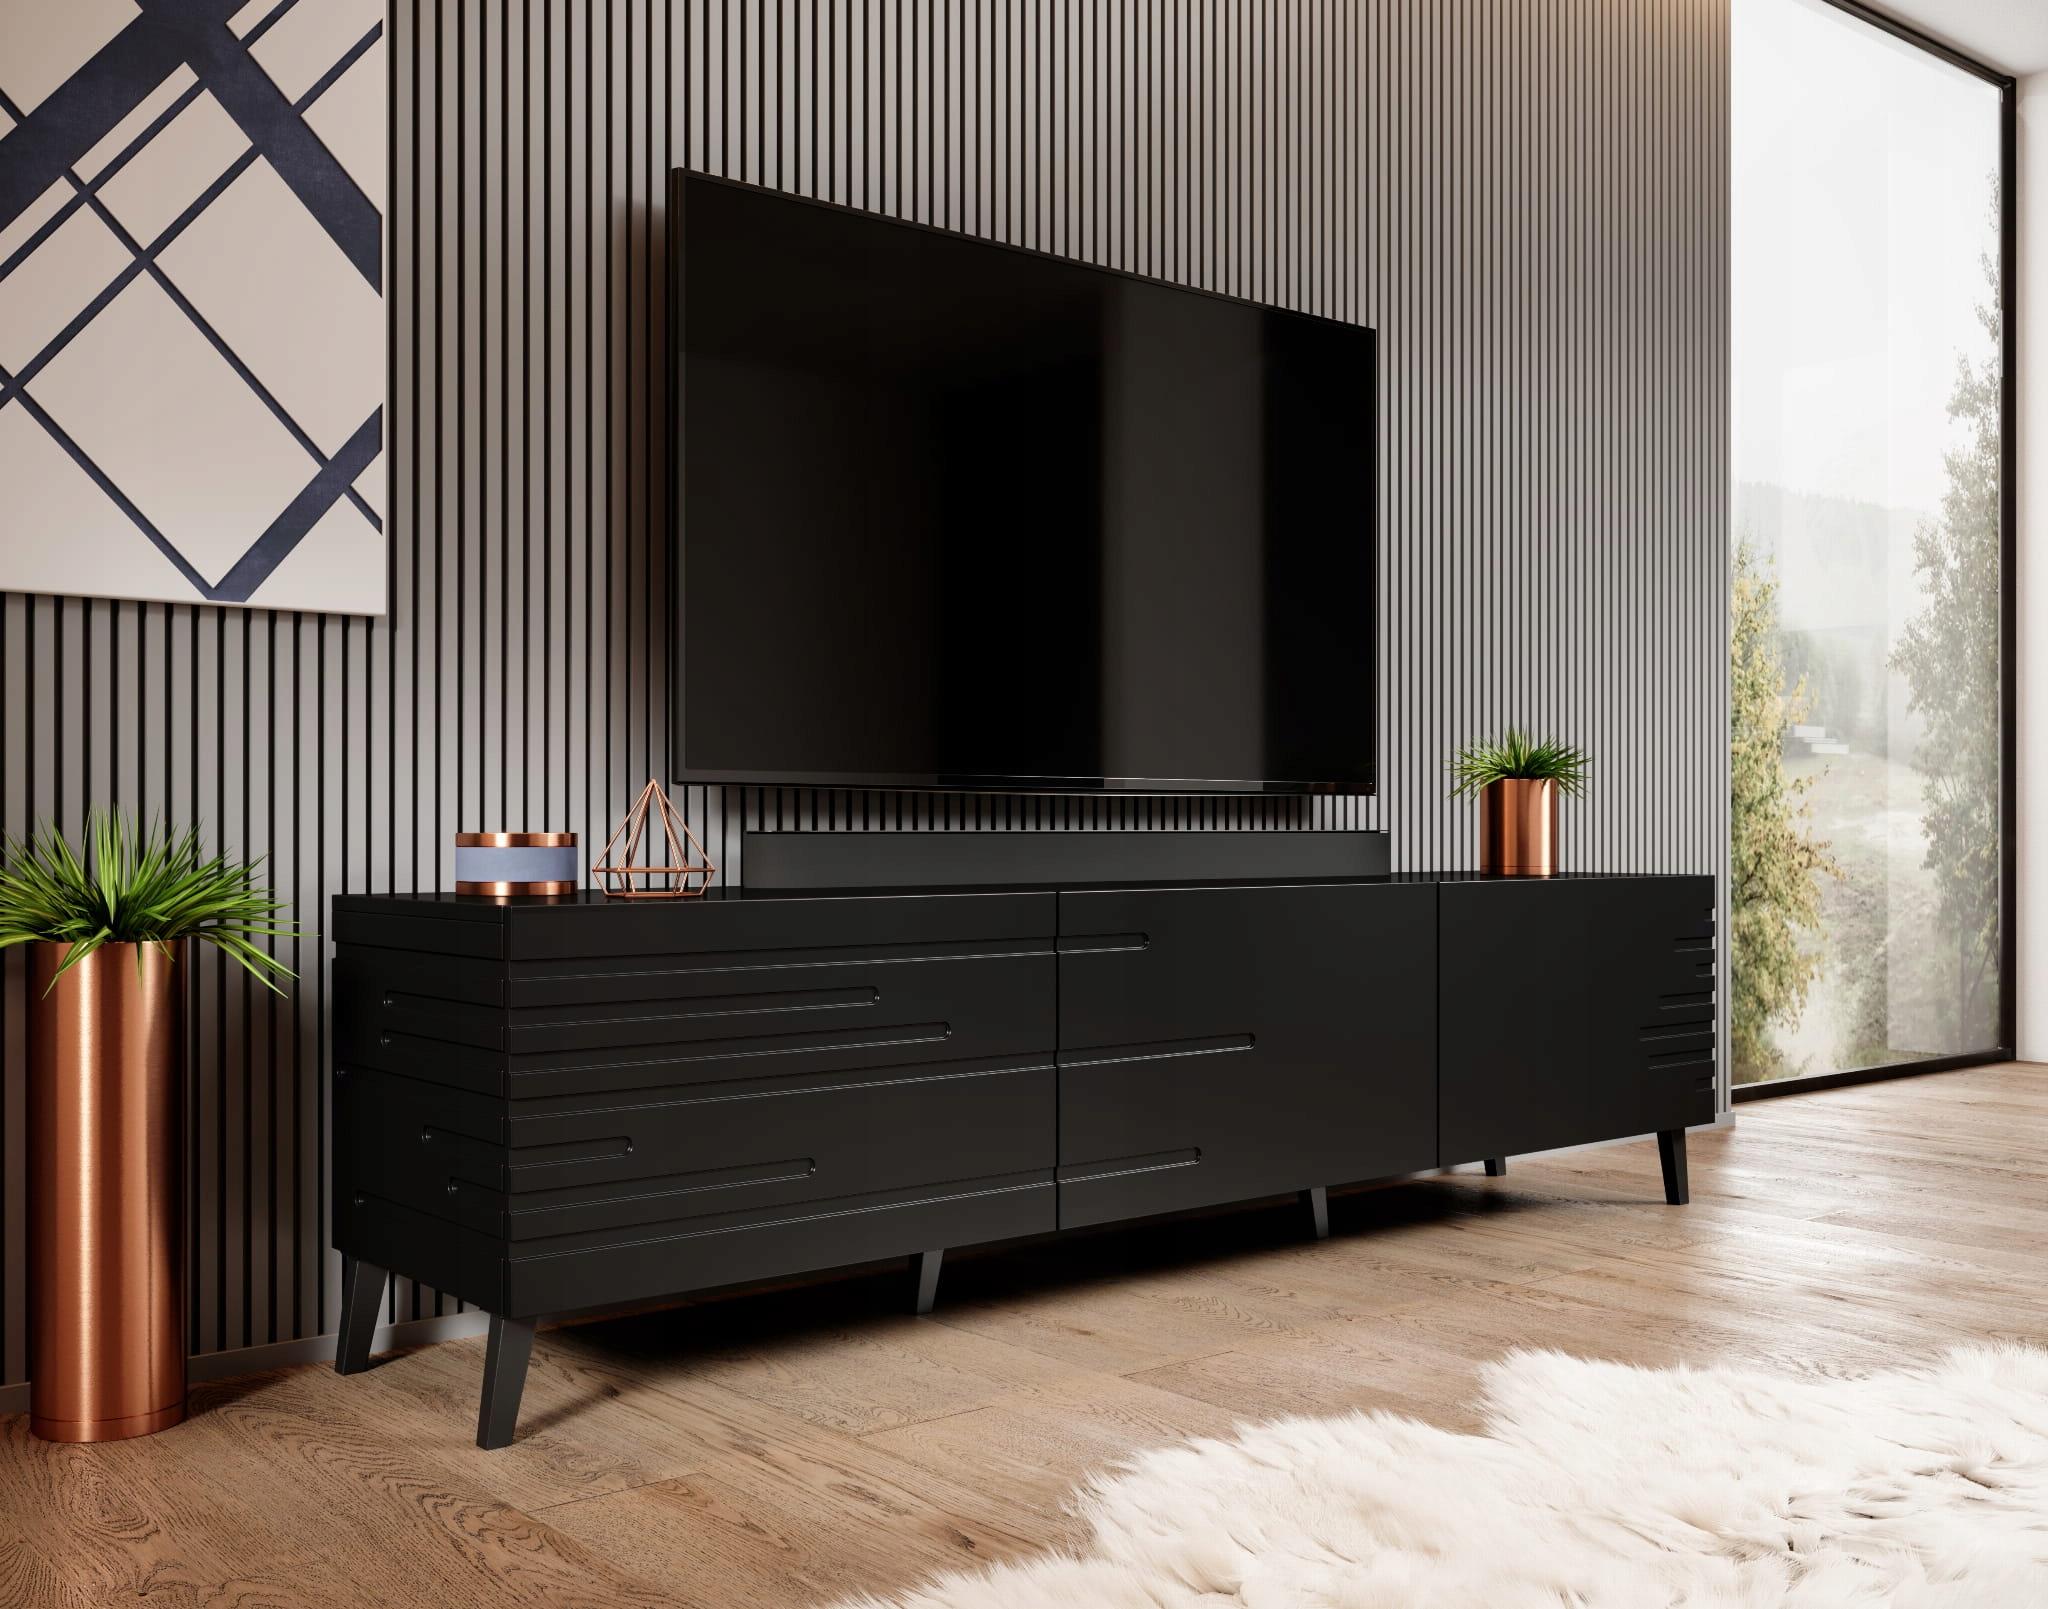 Черная подставка под телевизор на ножках - НОРМА - 186 см